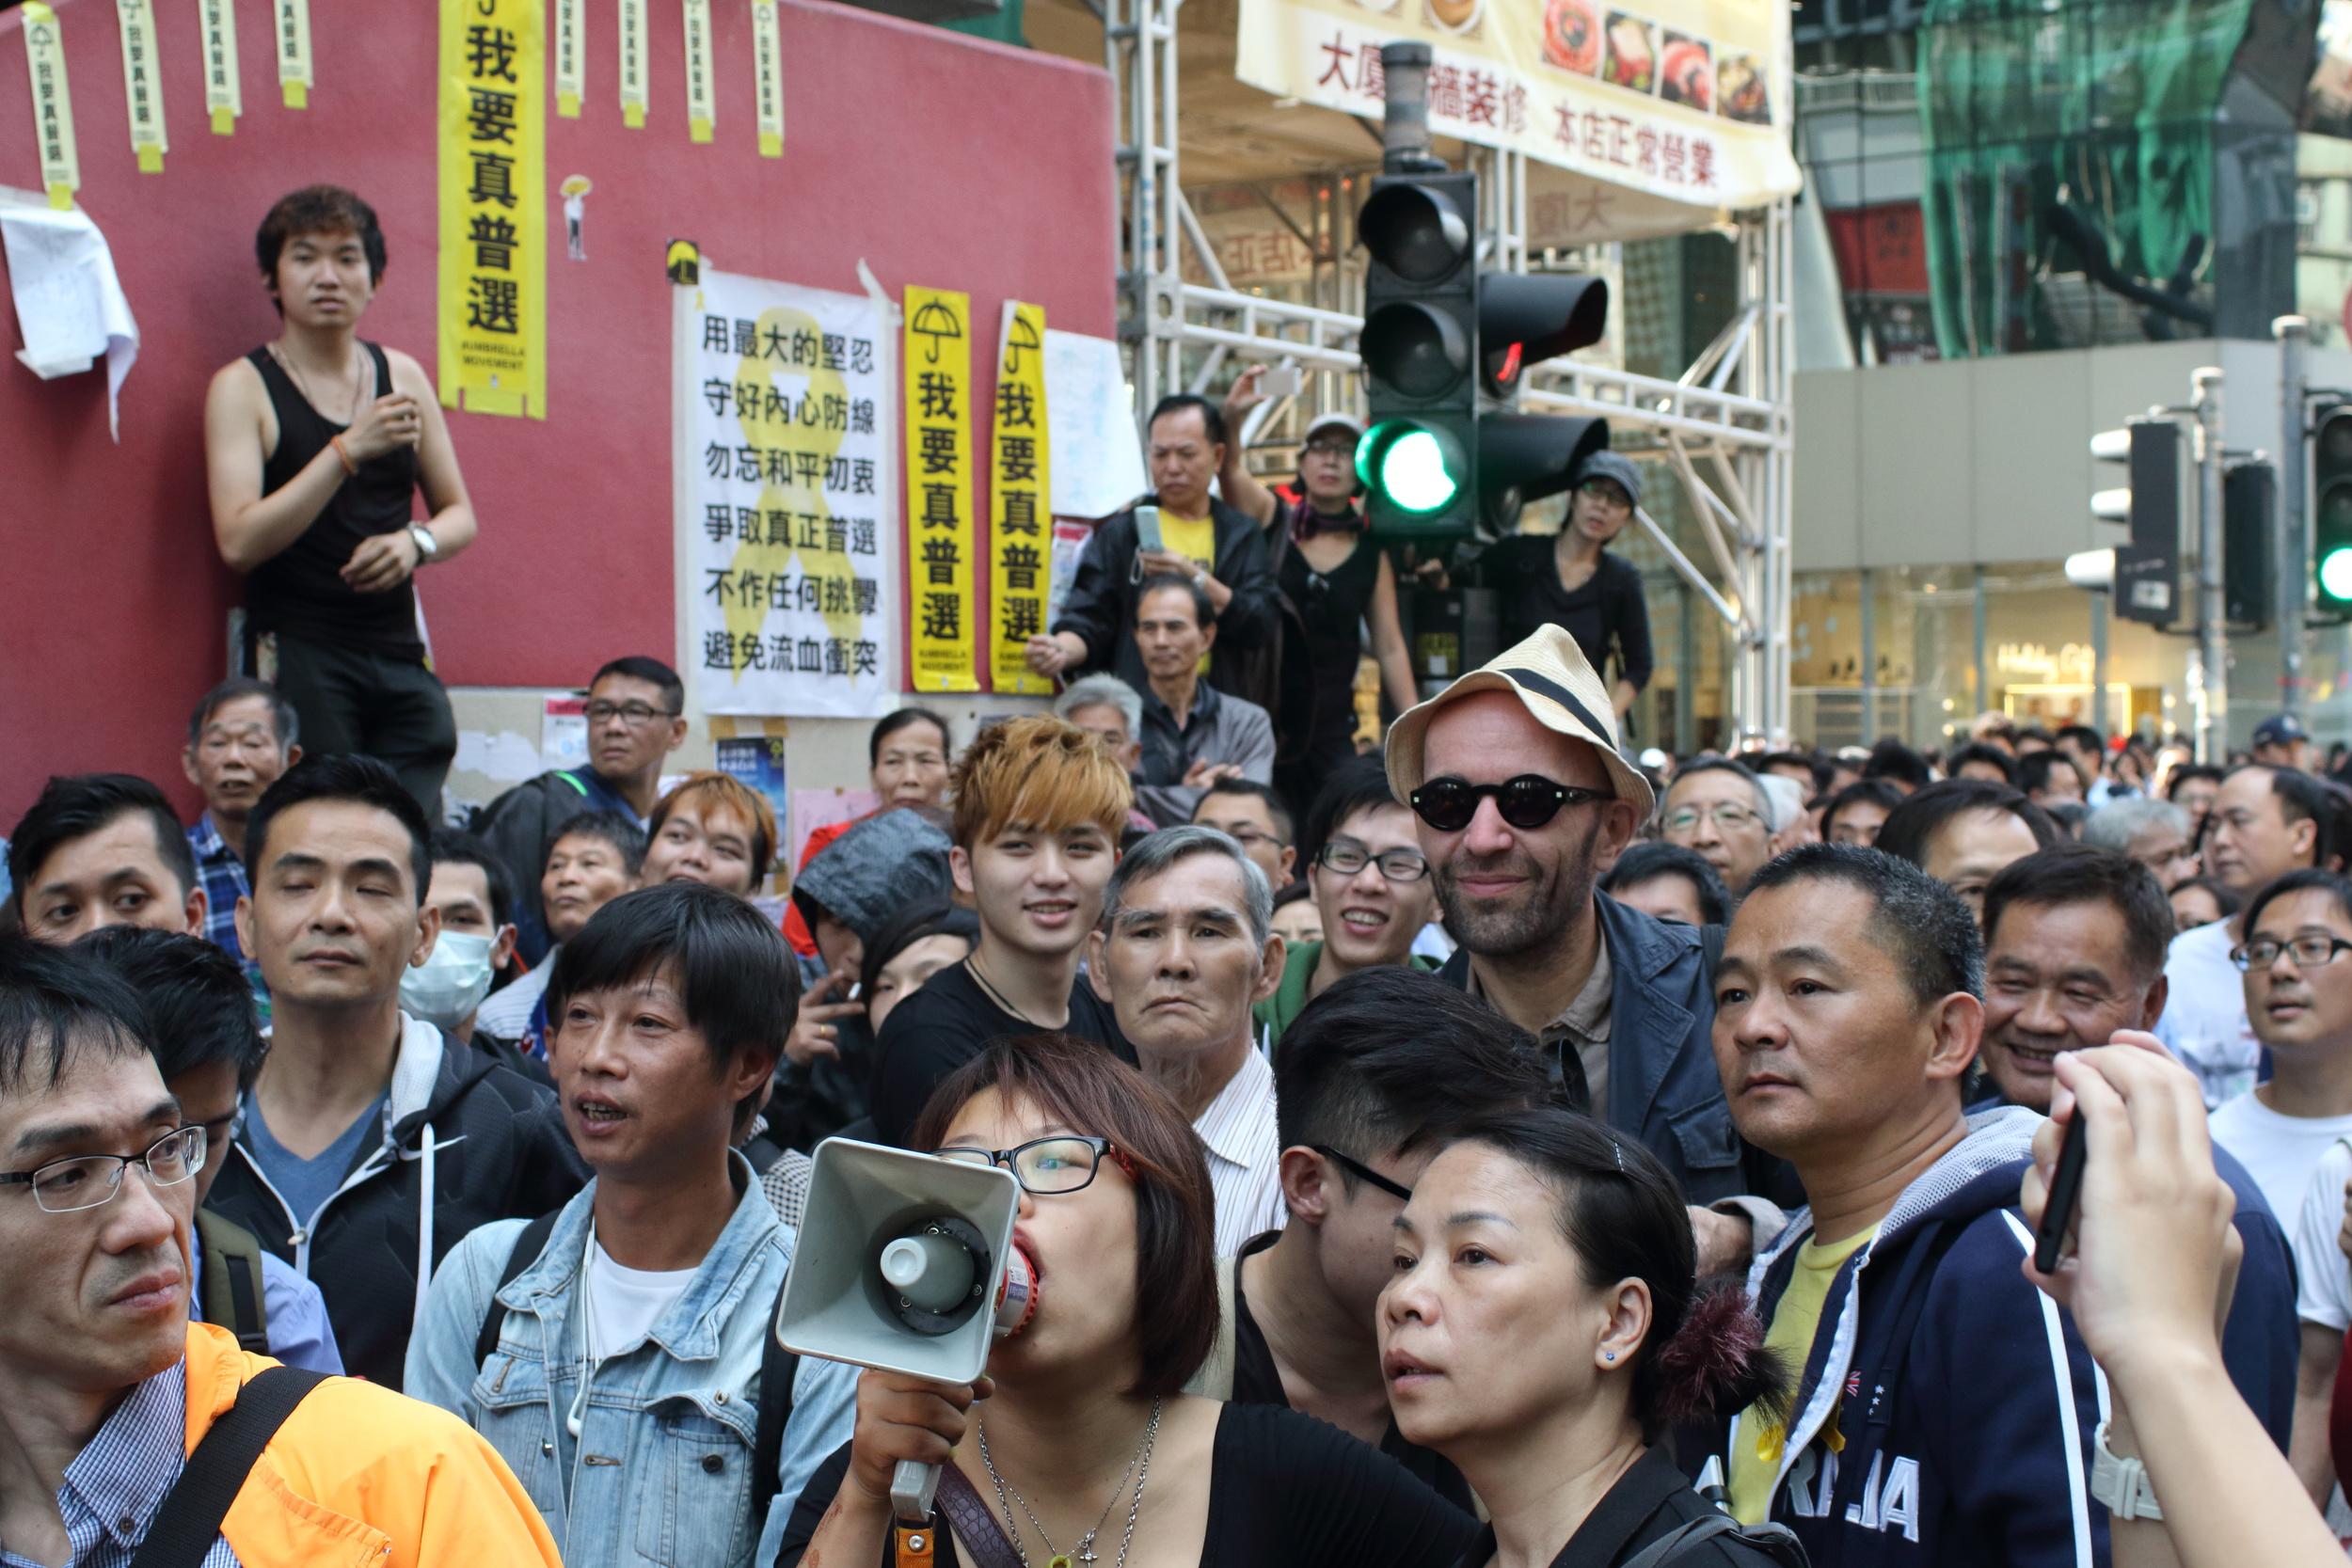 jfung1 Mongkok Argyle Clearance31.JPG